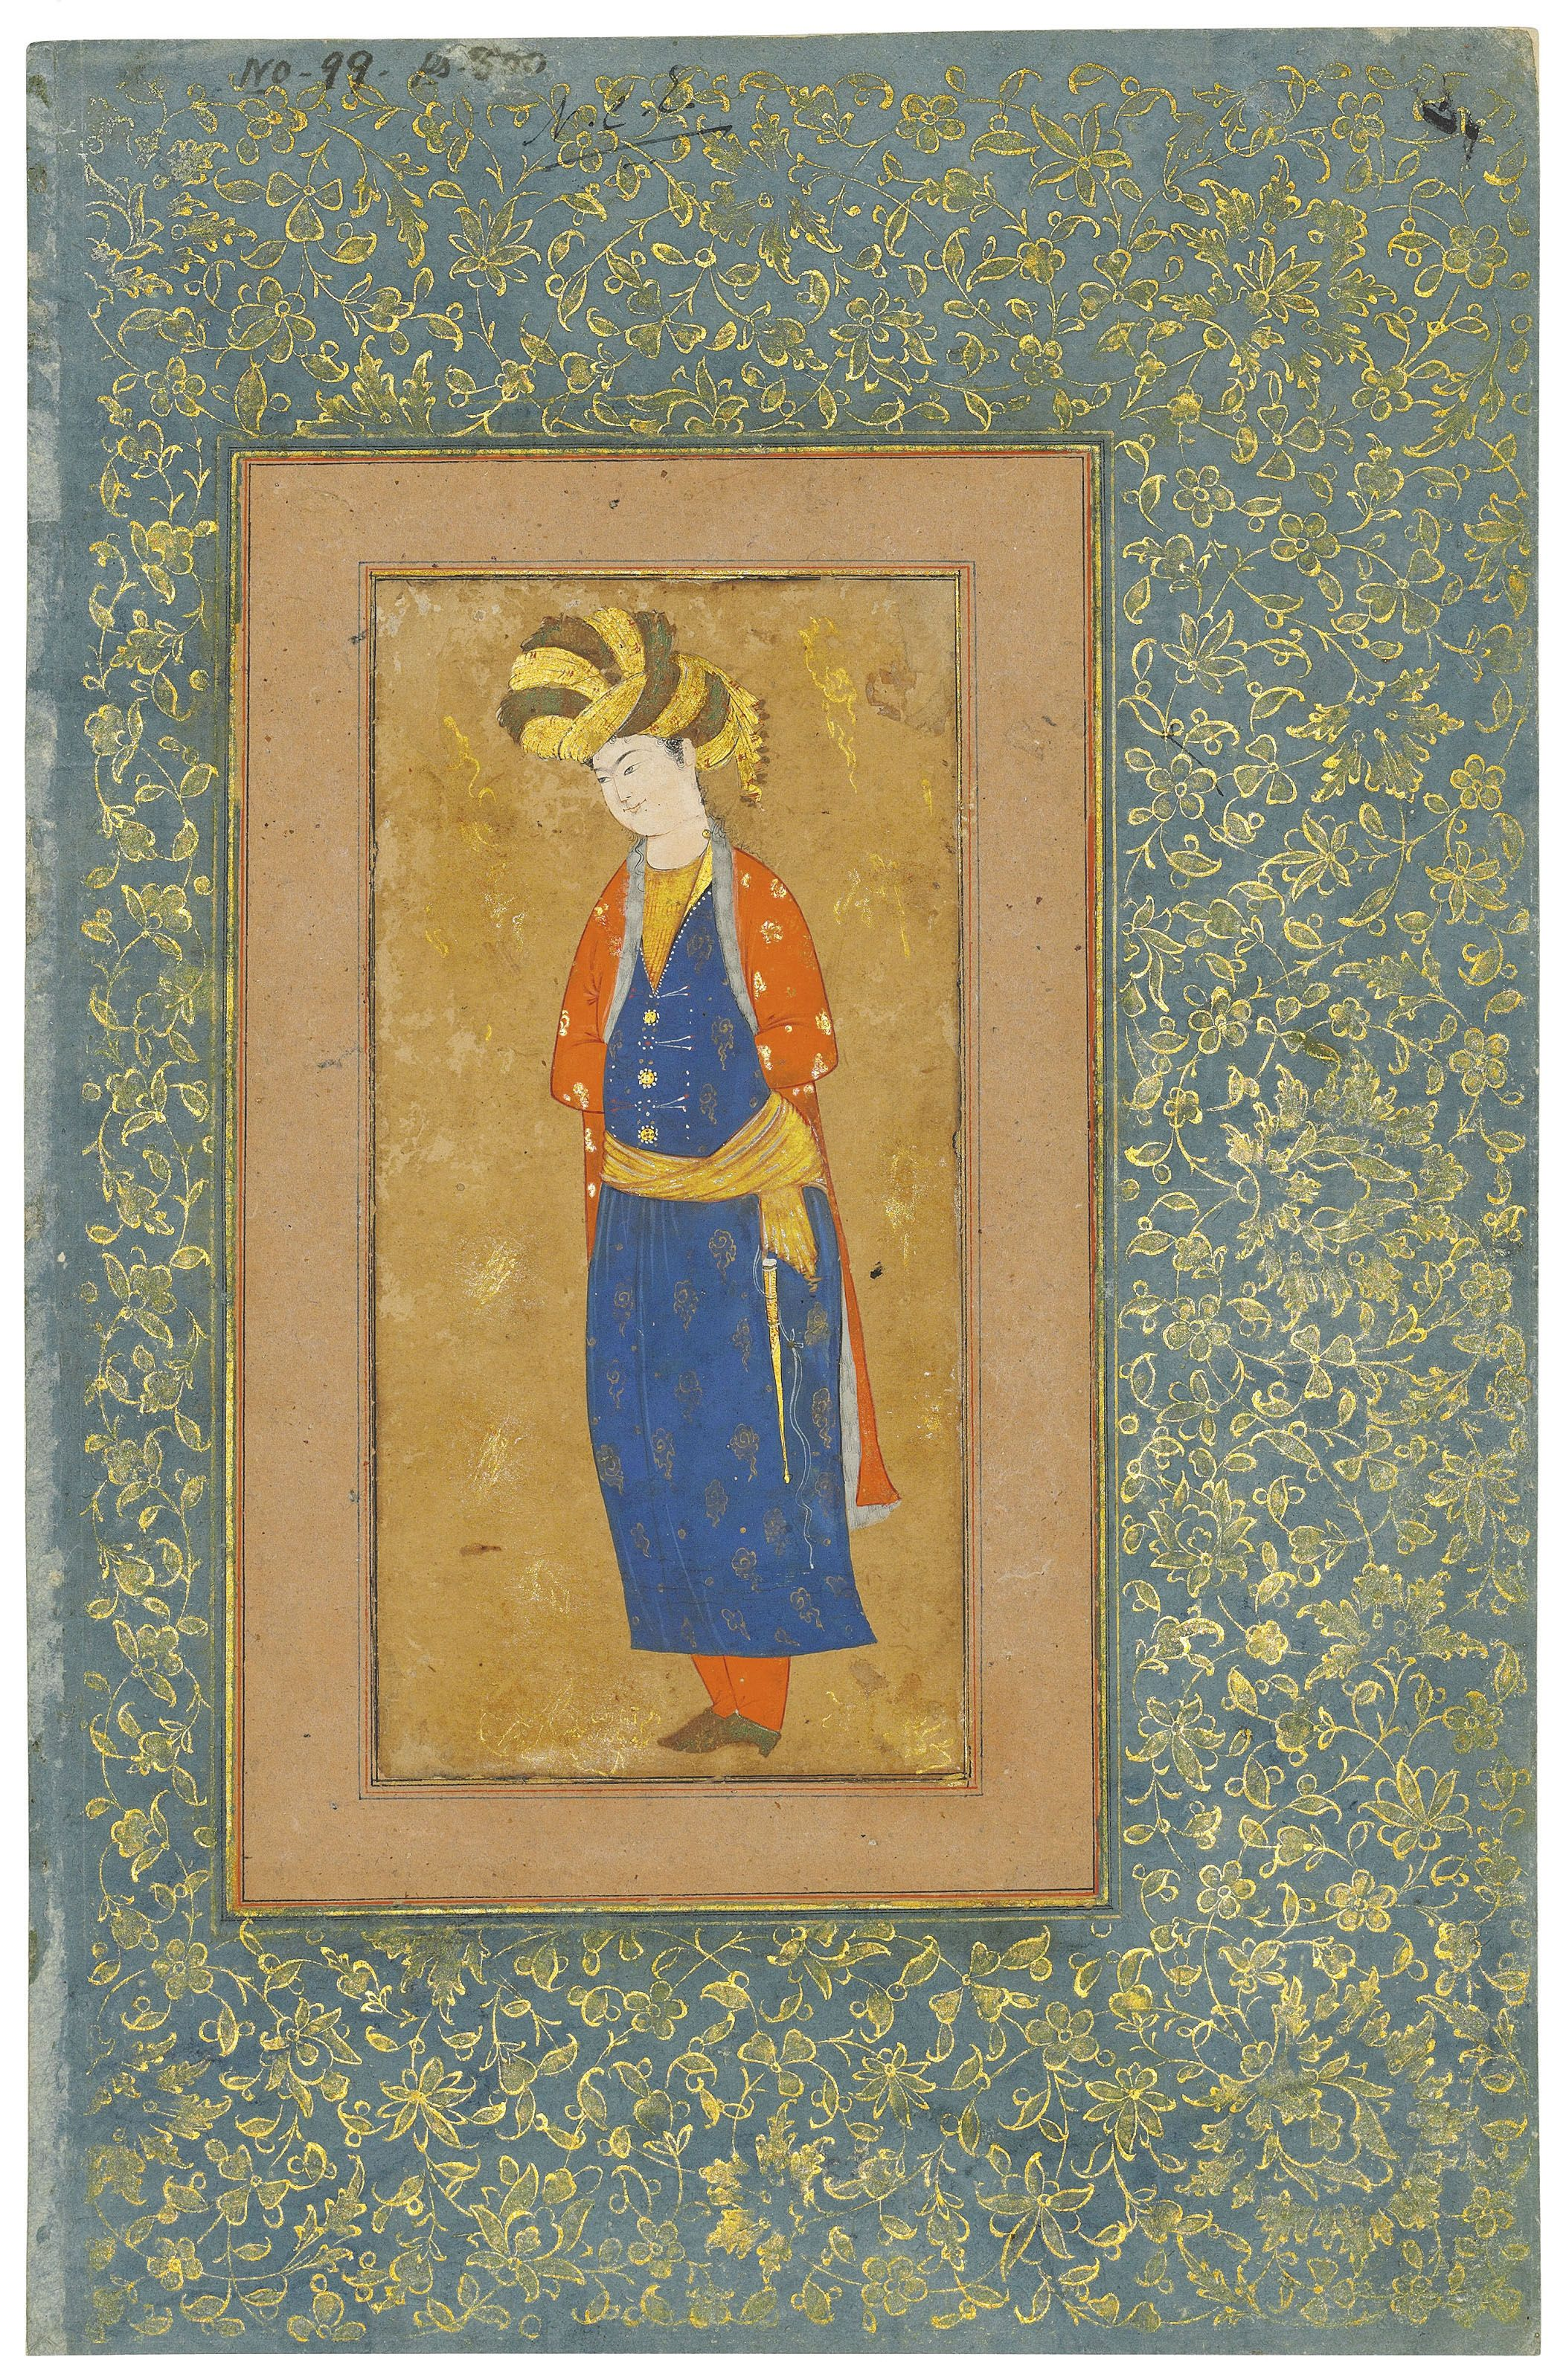 Pin by Rimski on صفوی Persian miniature, Painting